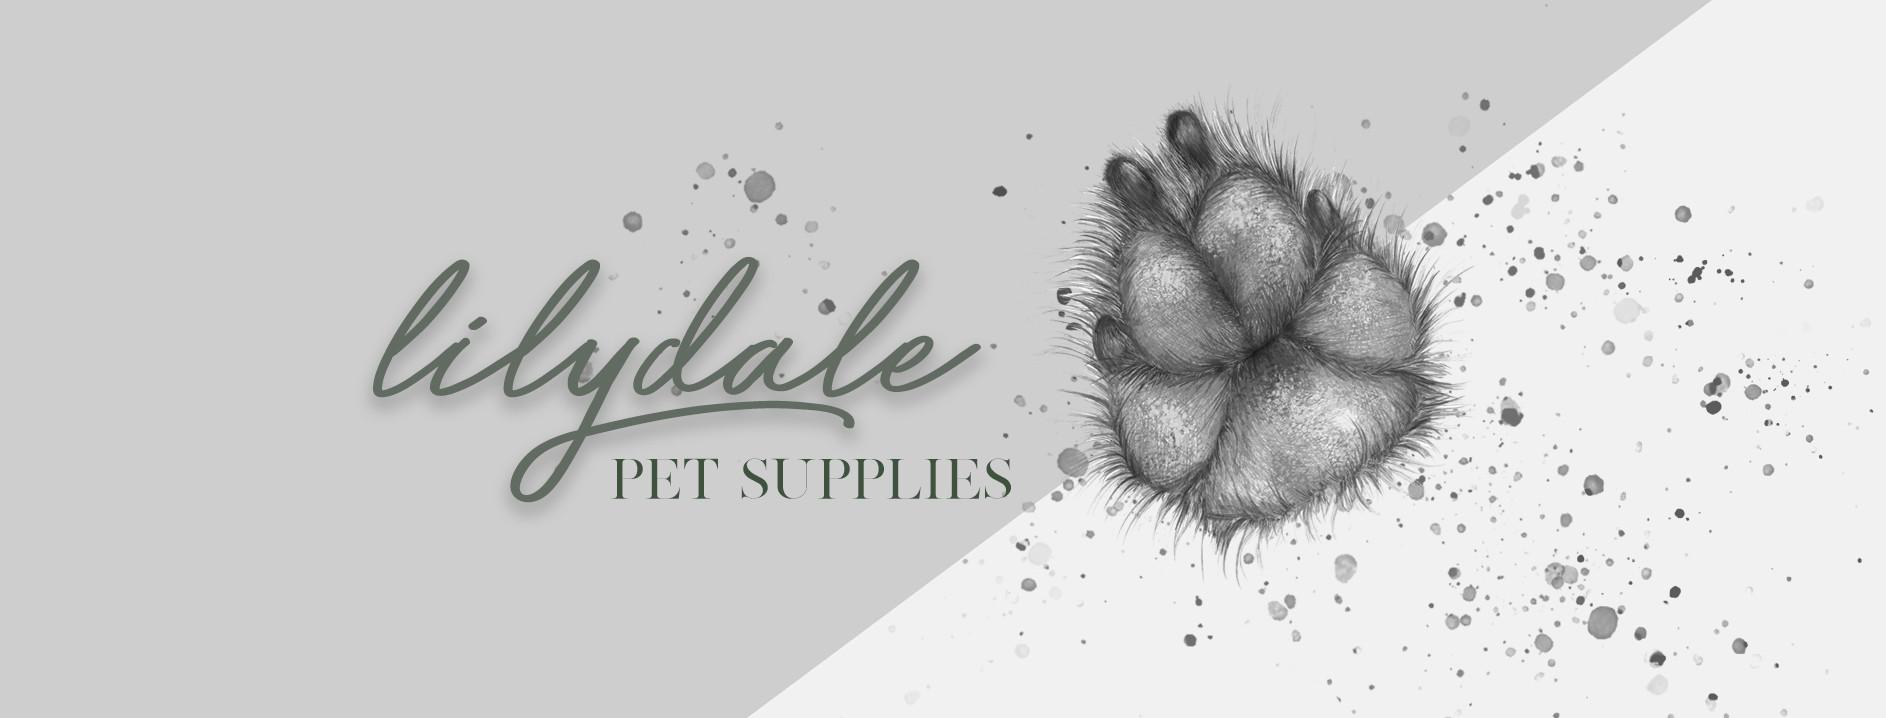 Facebook Banner Lilydale Pet Supplies.jp